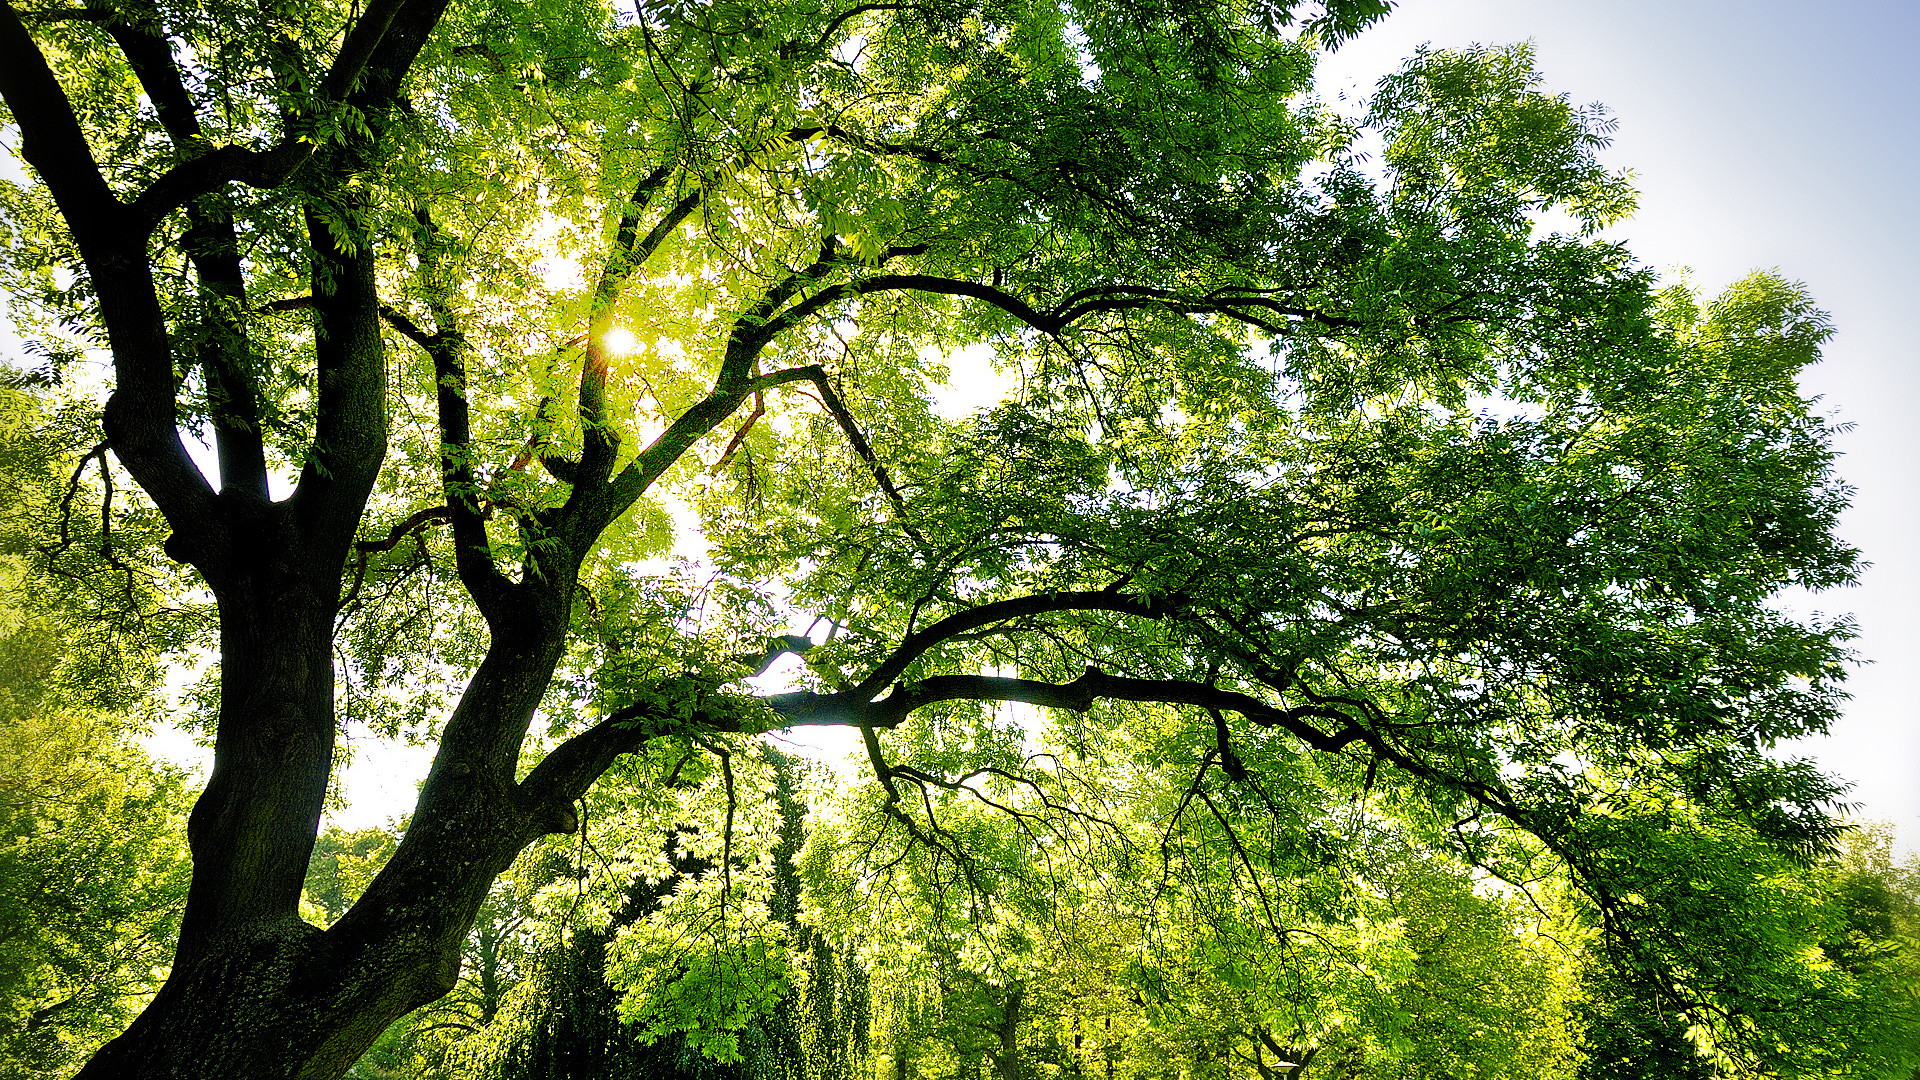 Sfondi desktop paesaggi hd albero secolare sfondi hd for Desktop paesaggi